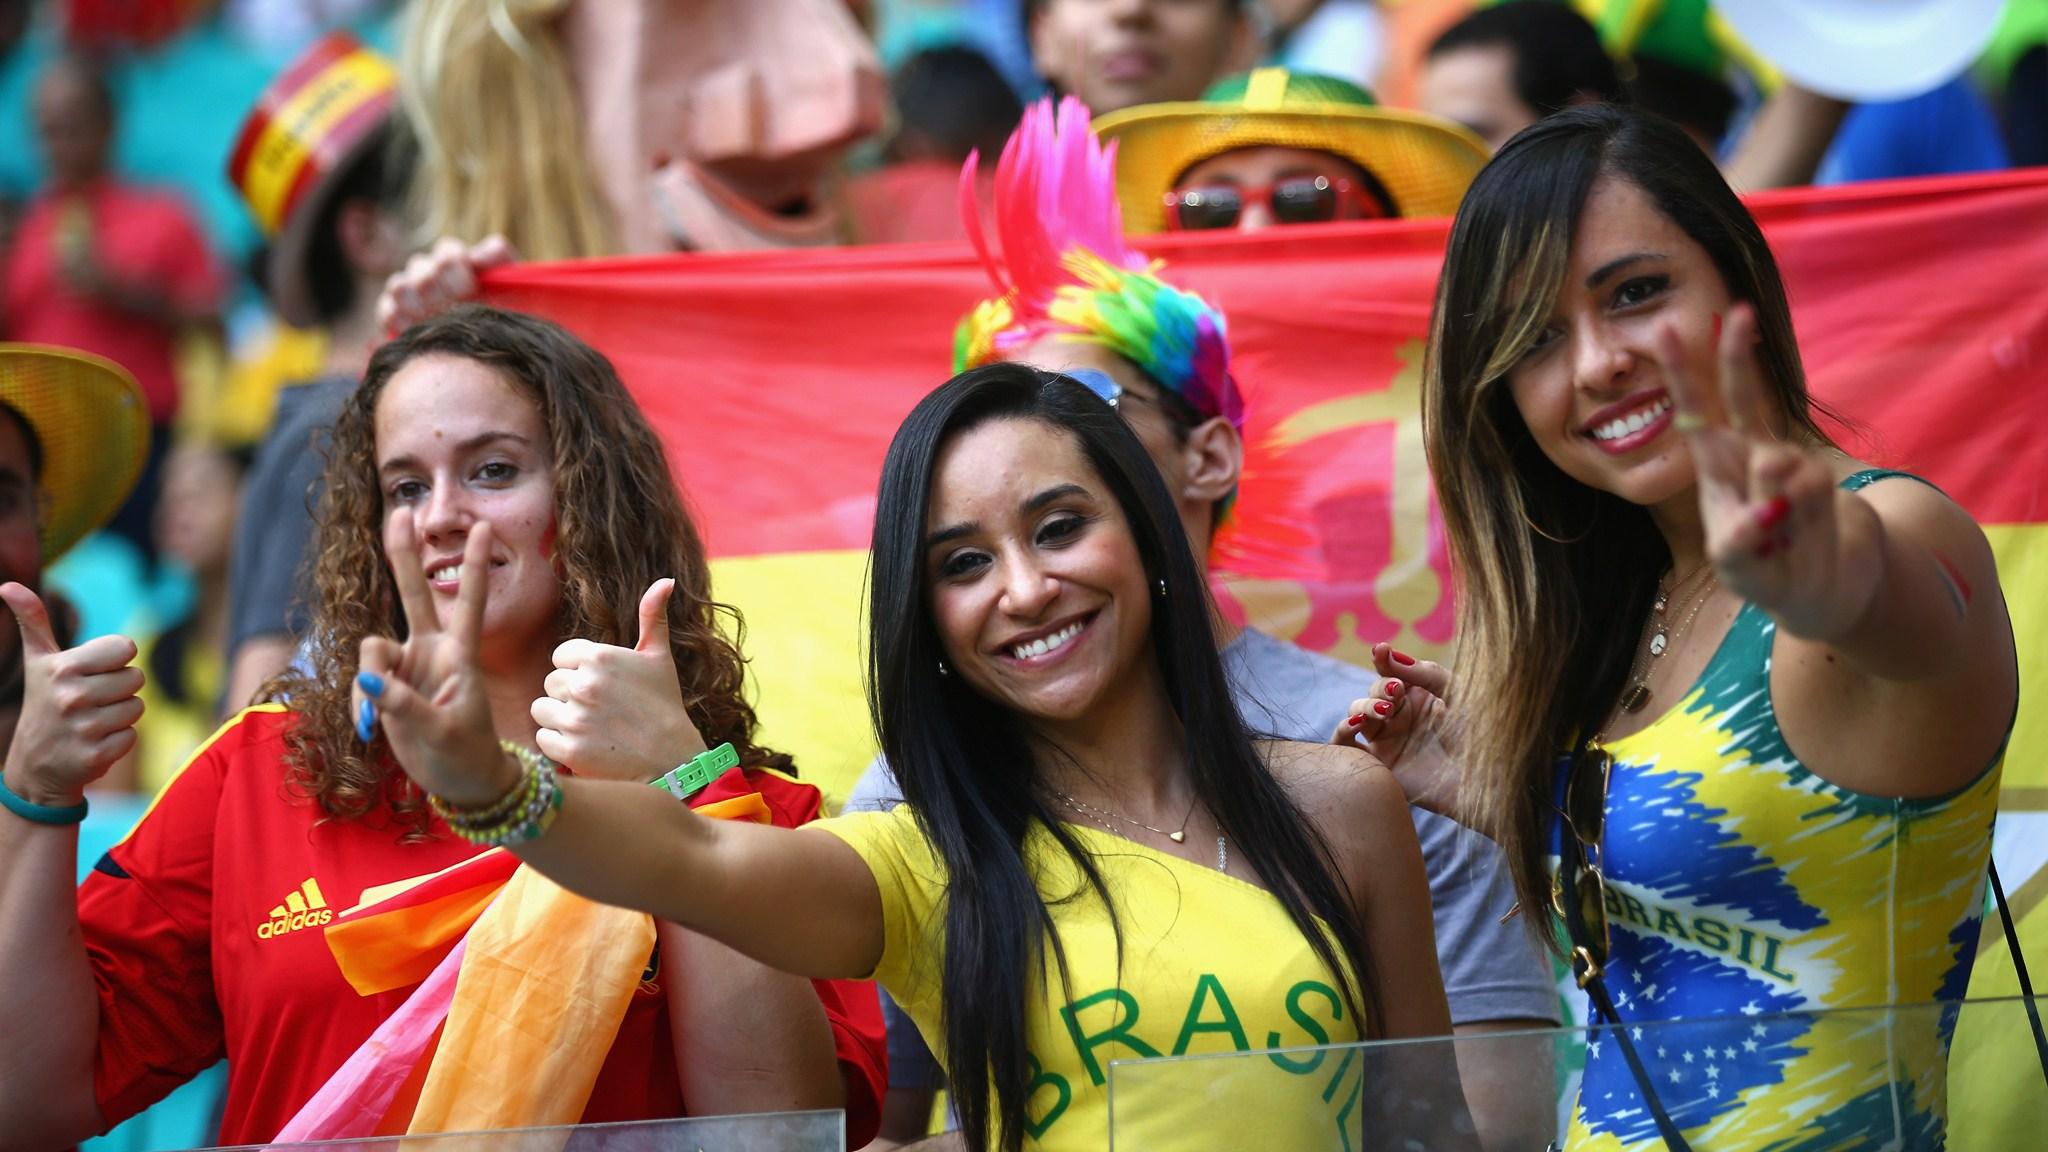 147 - Spain-Netherlands [1-5] -- 13 Jun 2014 - 16-00 -- Salvador - Arena Fonte Nova